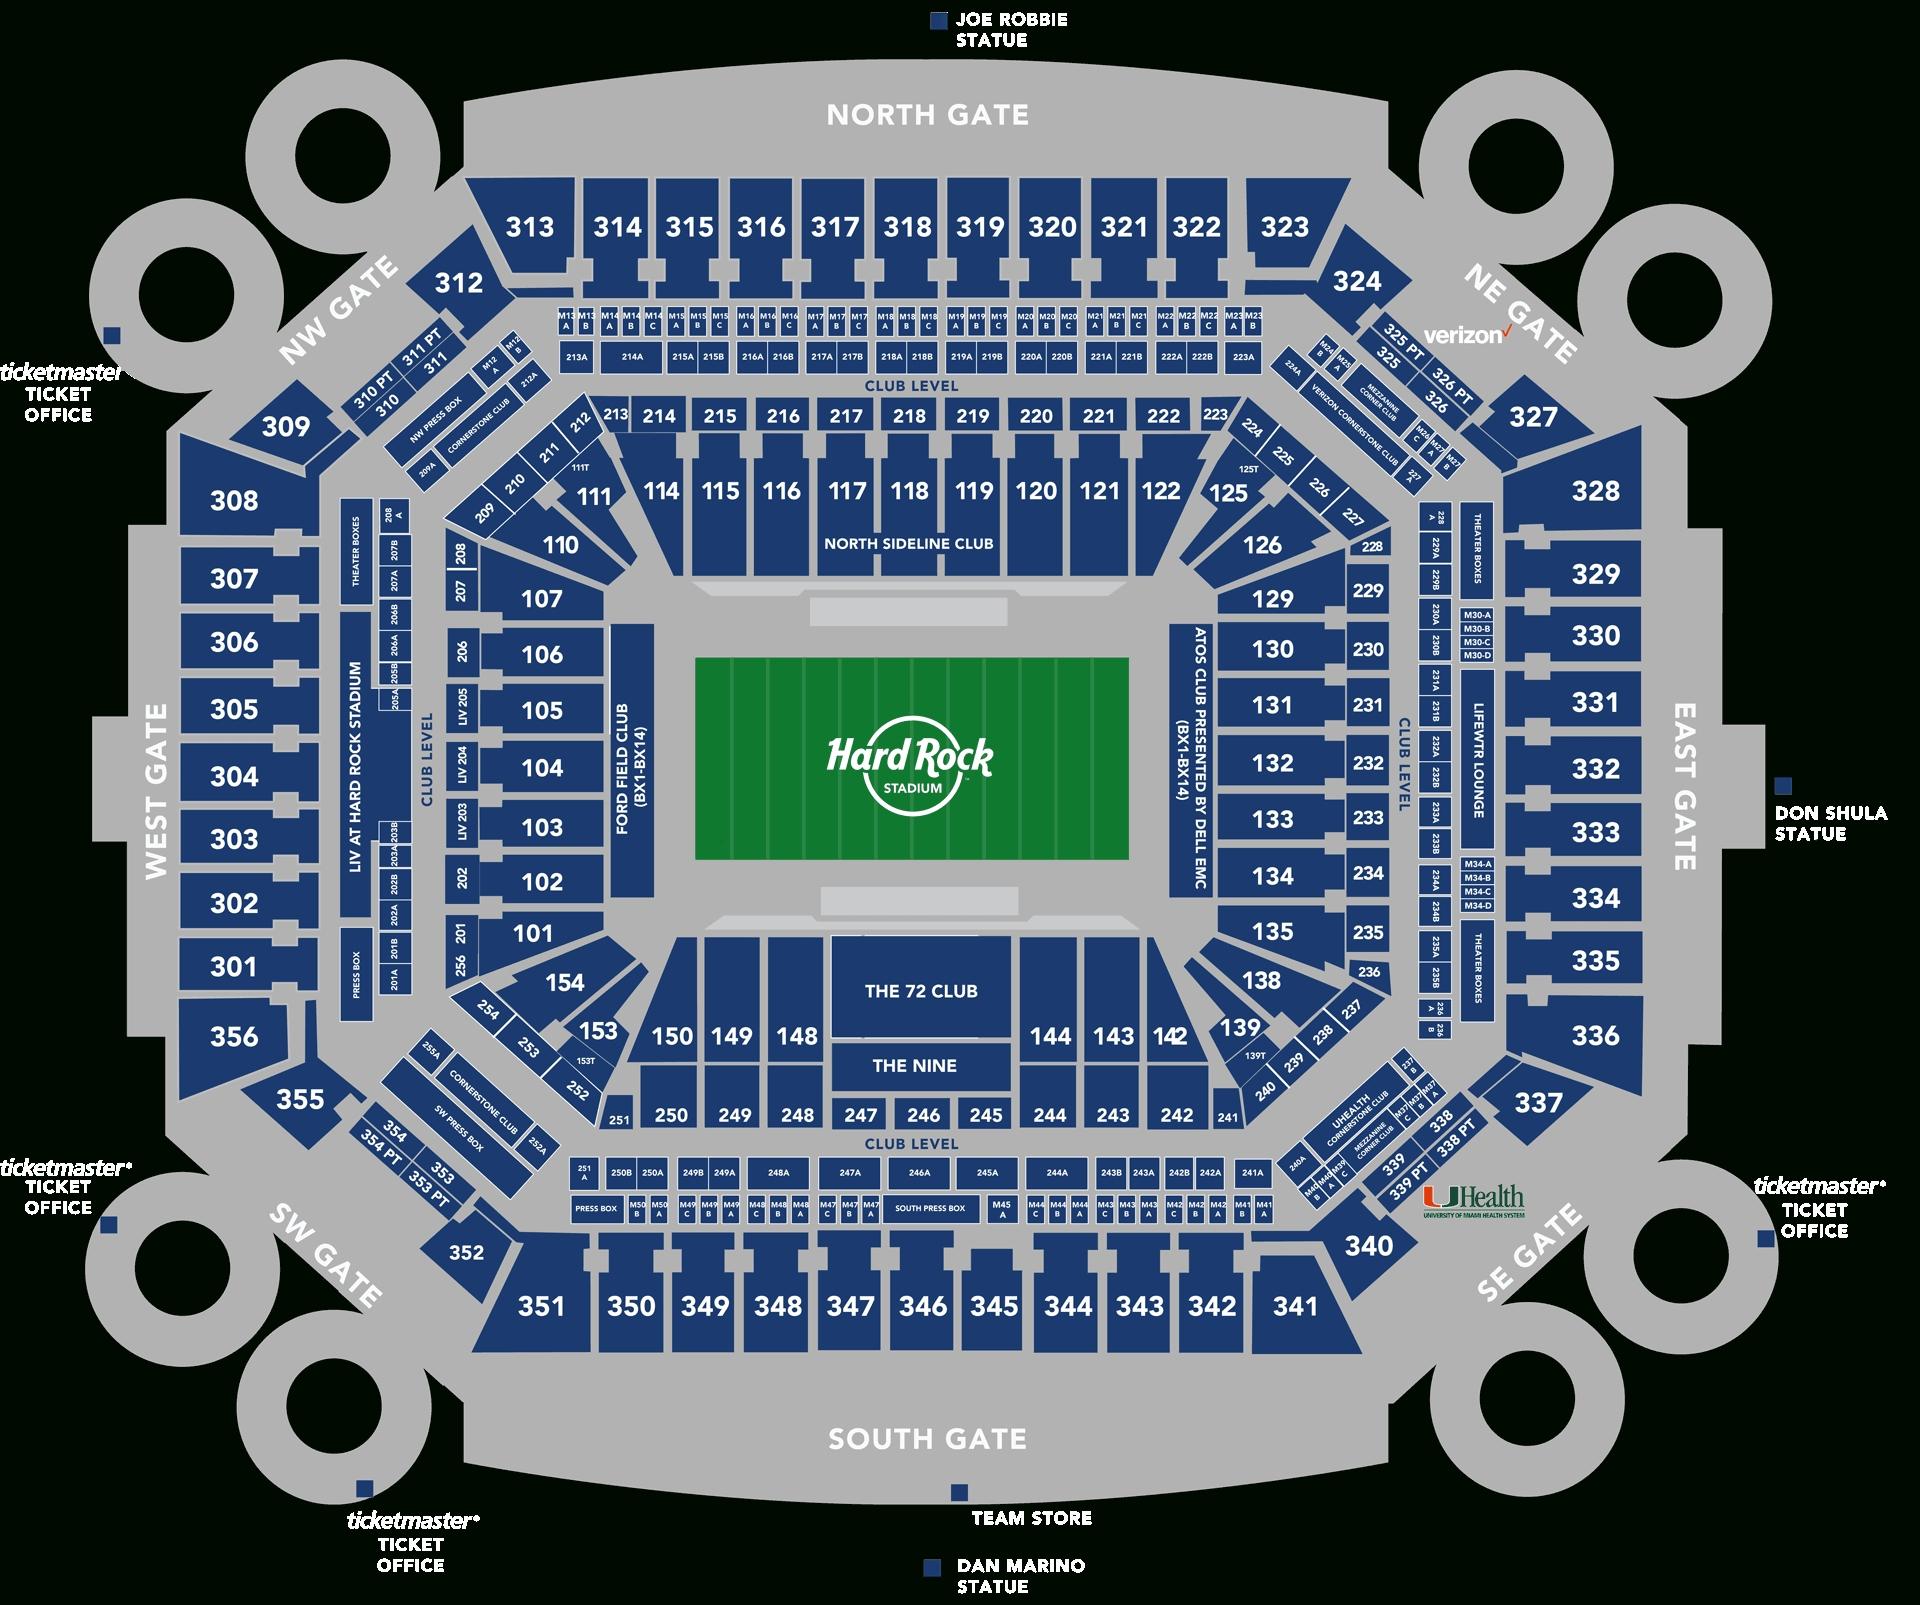 Stadium Seating Chart - Hard Rock Stadium regarding Super Bowl Stadium Seating Chart